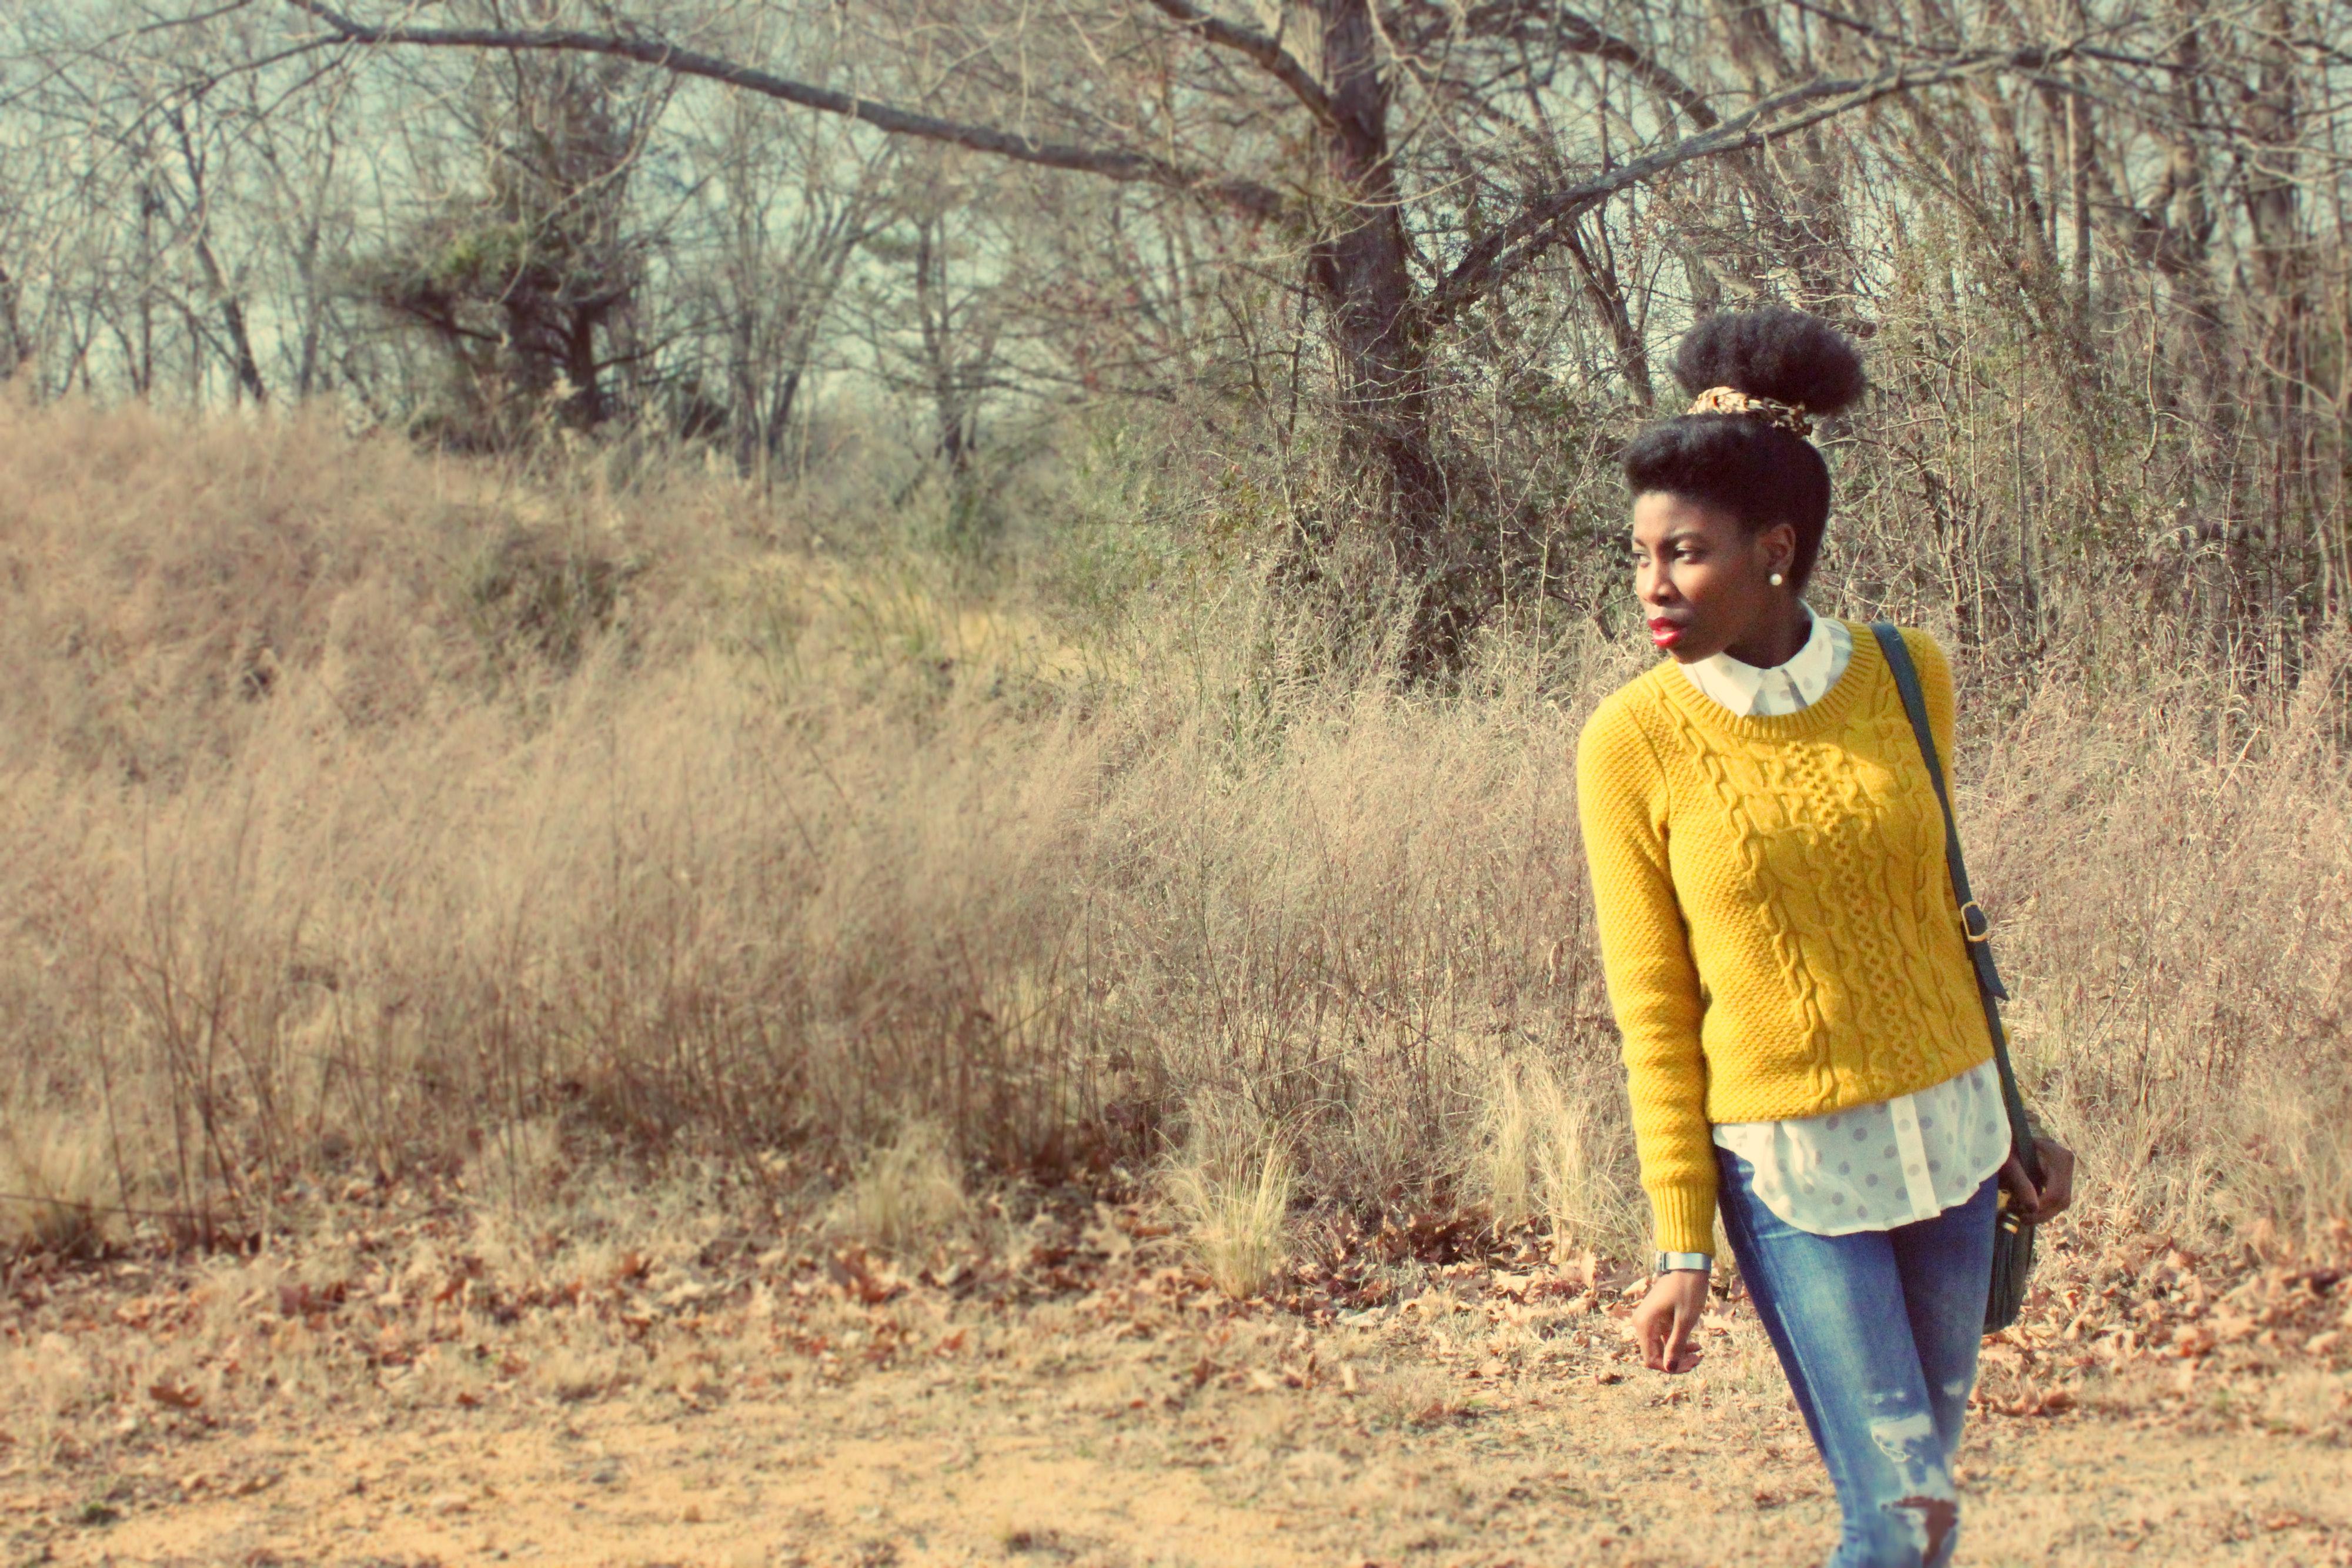 Mustard Cable Knit Sweater & Polka Dots! | Hera Nyx